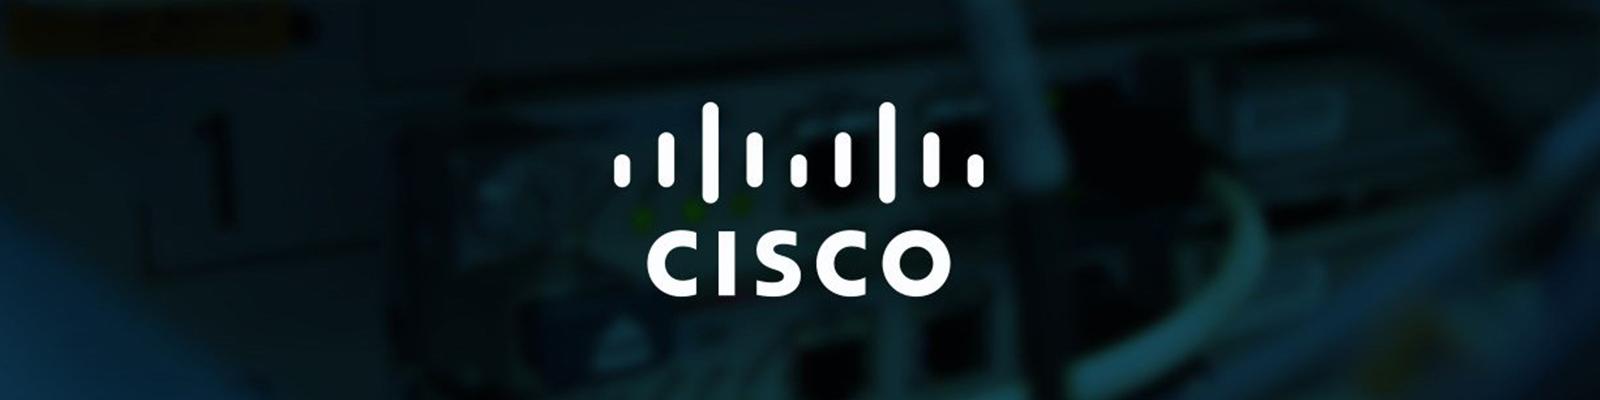 Phân phối Cisco, module sfp cisco, module sfp juniper, module sfp 1gb, module sfp10gb chính hãng